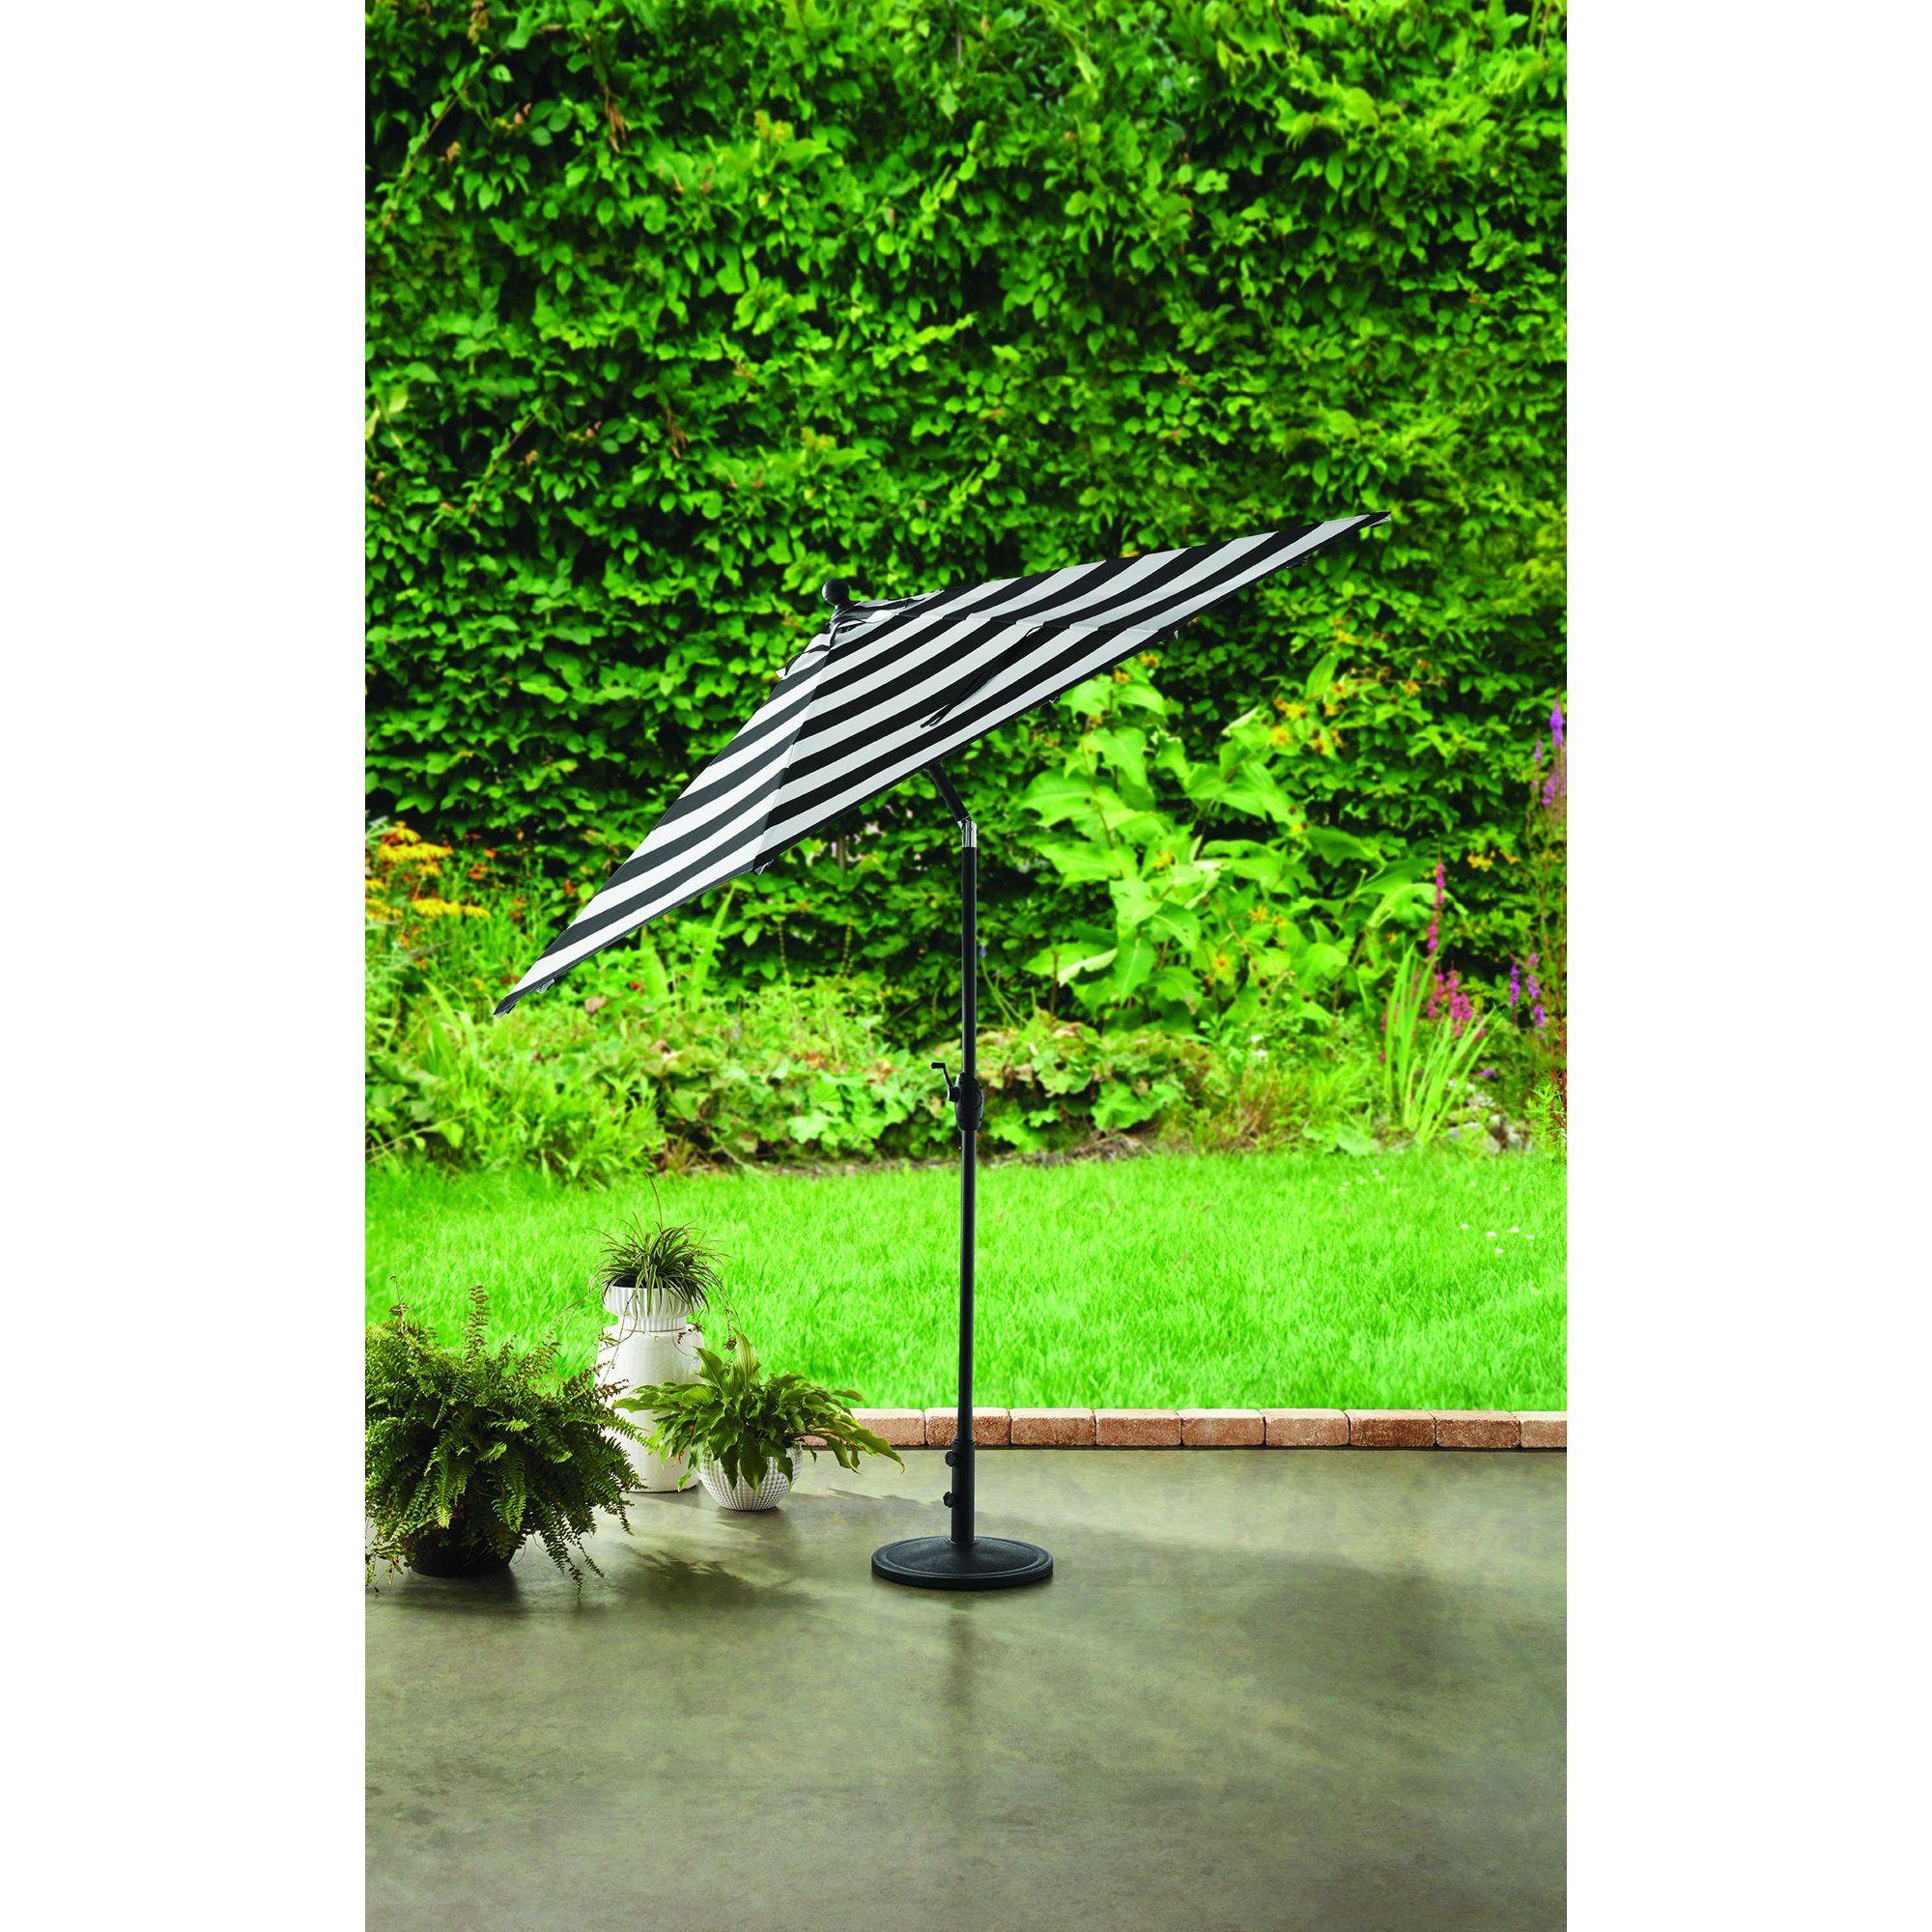 3394548c3fa5c88921cbf4241baa50f7 - Better Homes And Gardens 9 Ft Umbrella